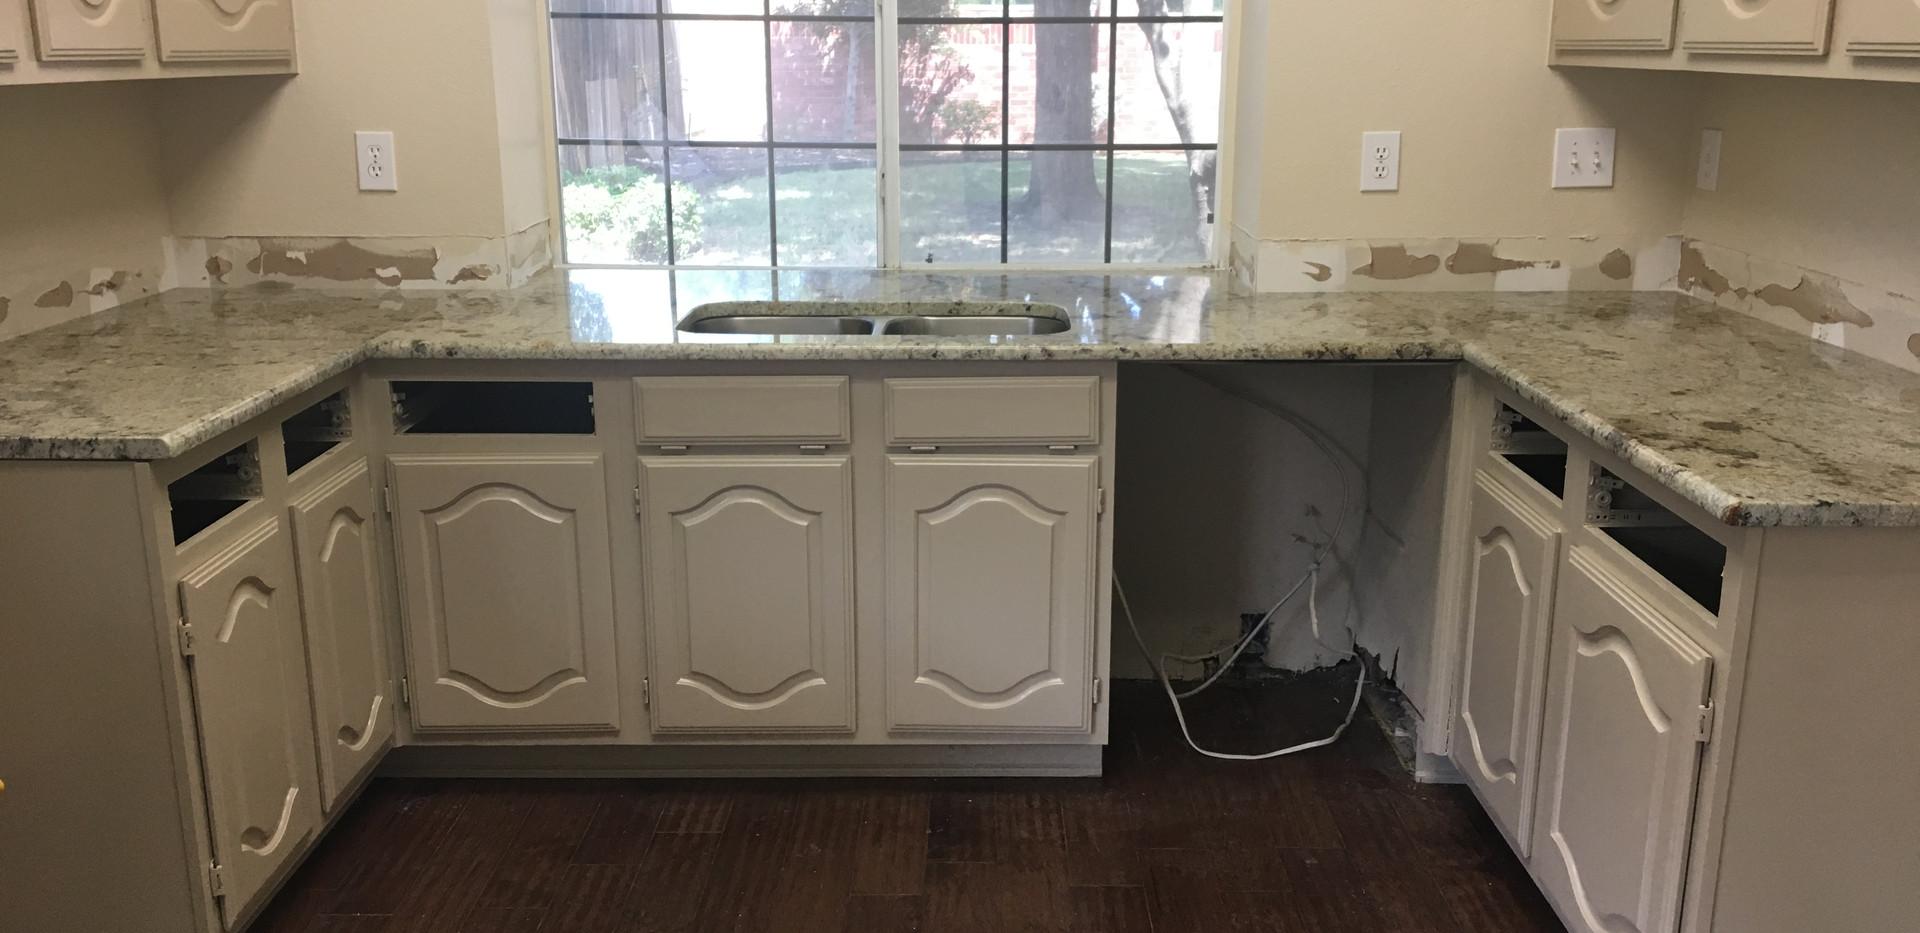 gray_granite_kitchen_countertop_sink.JPG